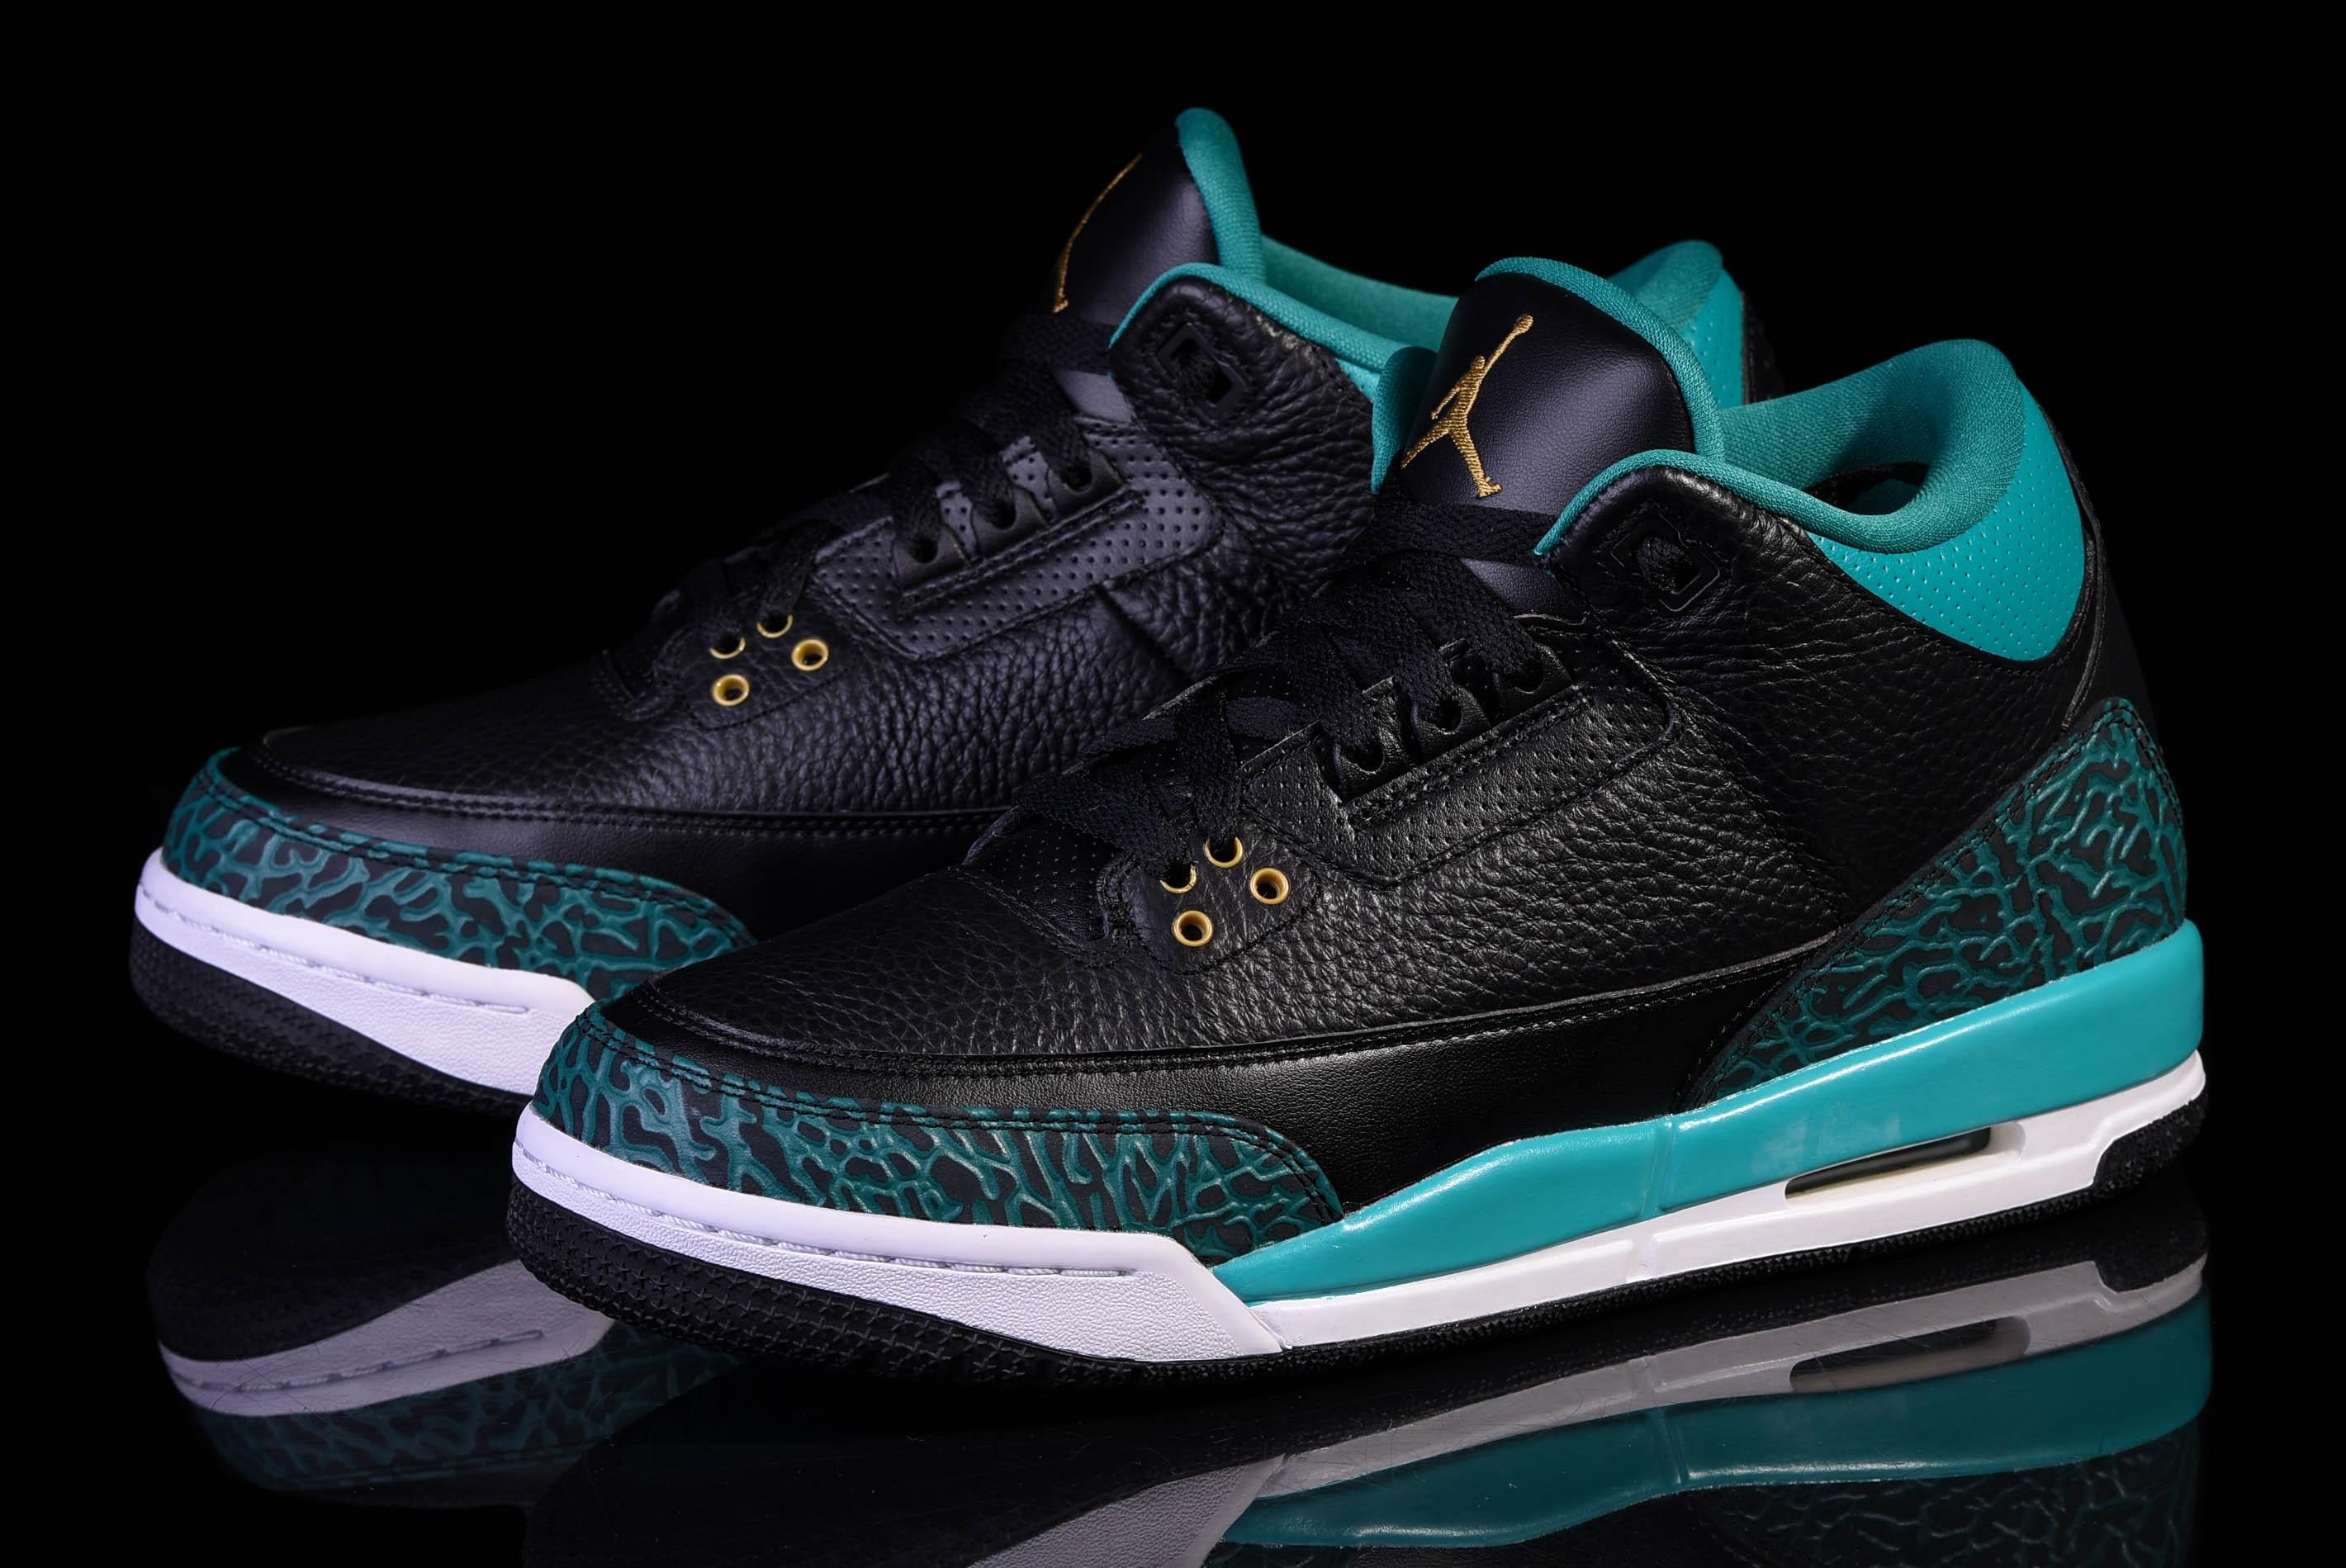 Nike Chaussures Air Jordan 3 Retro GG Nike CrtCrZ